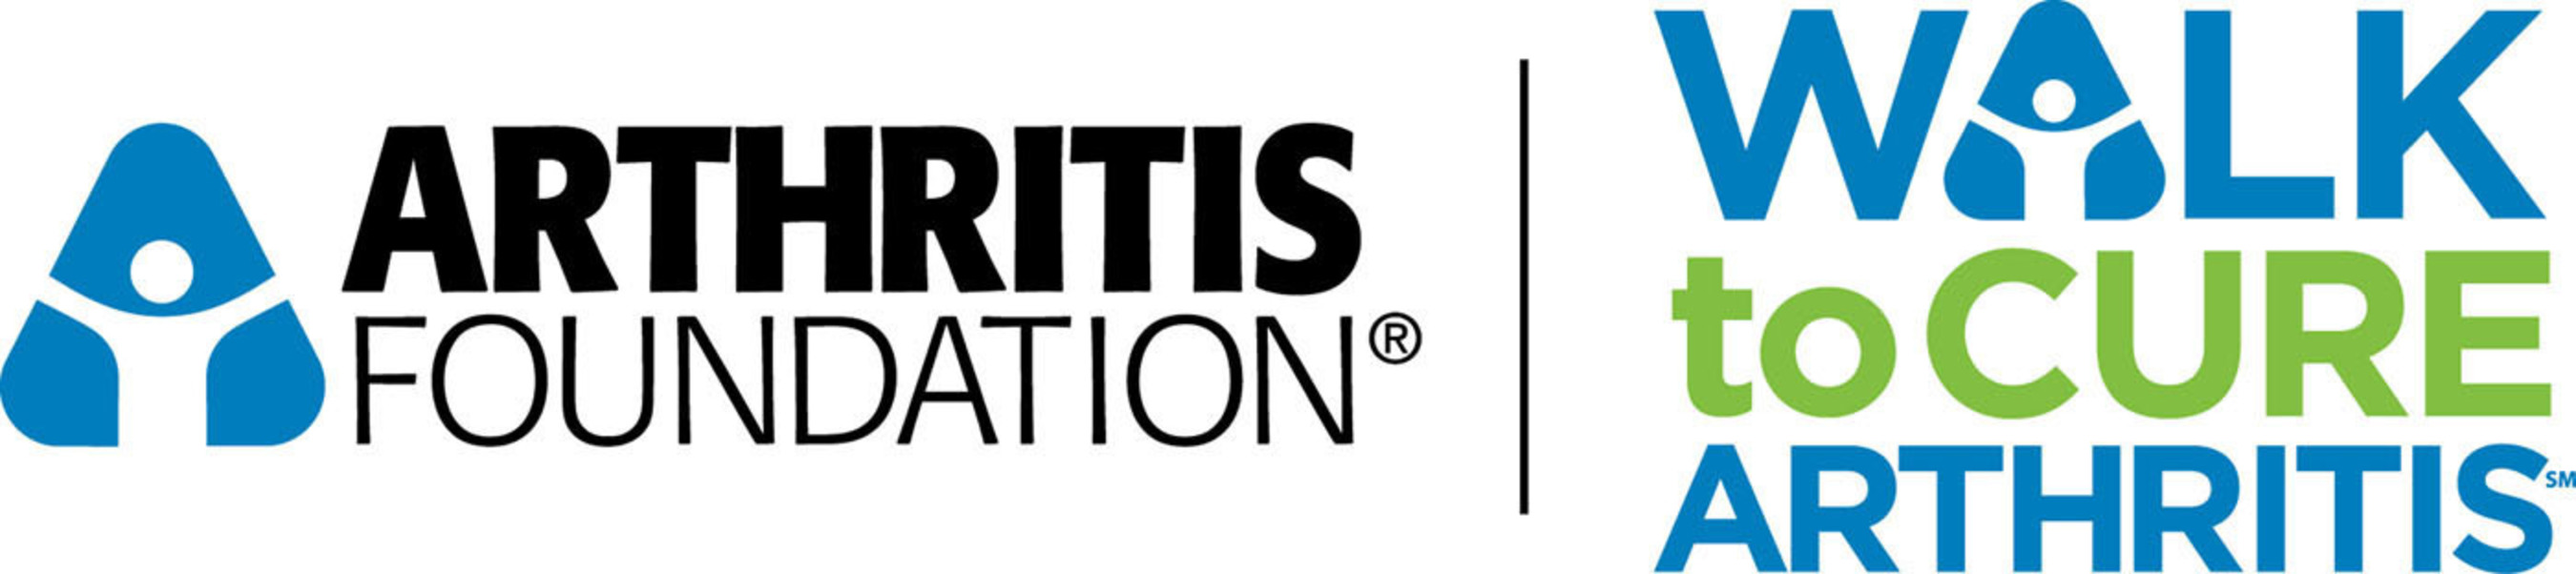 Walk to Cure Arthritis Logo. (PRNewsFoto/Arthritis Foundation) (PRNewsFoto/ARTHRITIS FOUNDATION)